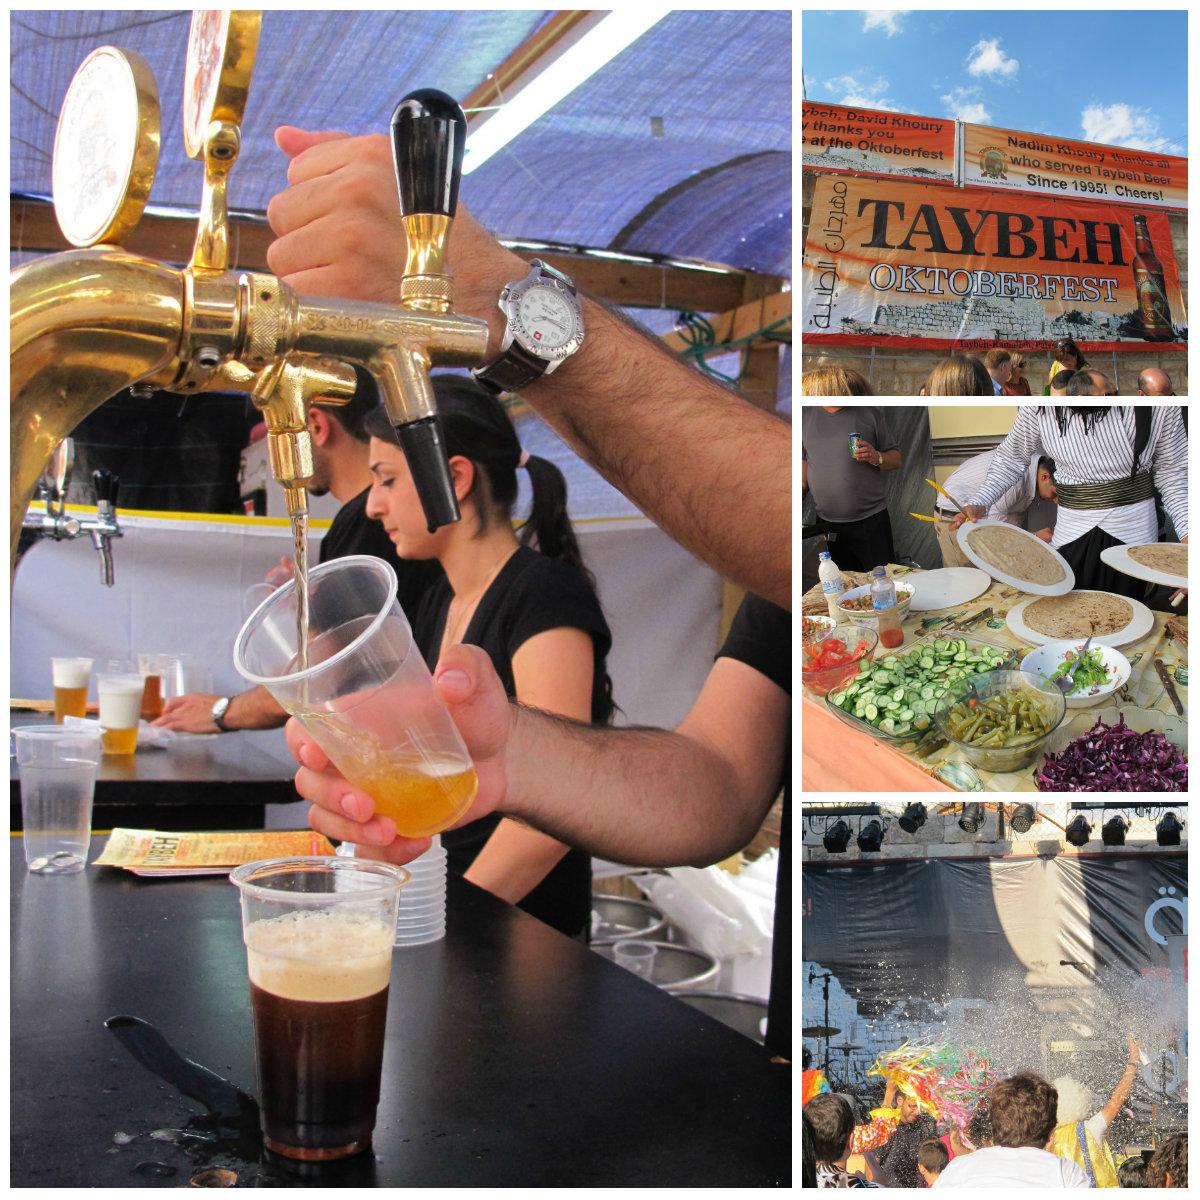 Taybeh Palestinian Oktoberfest